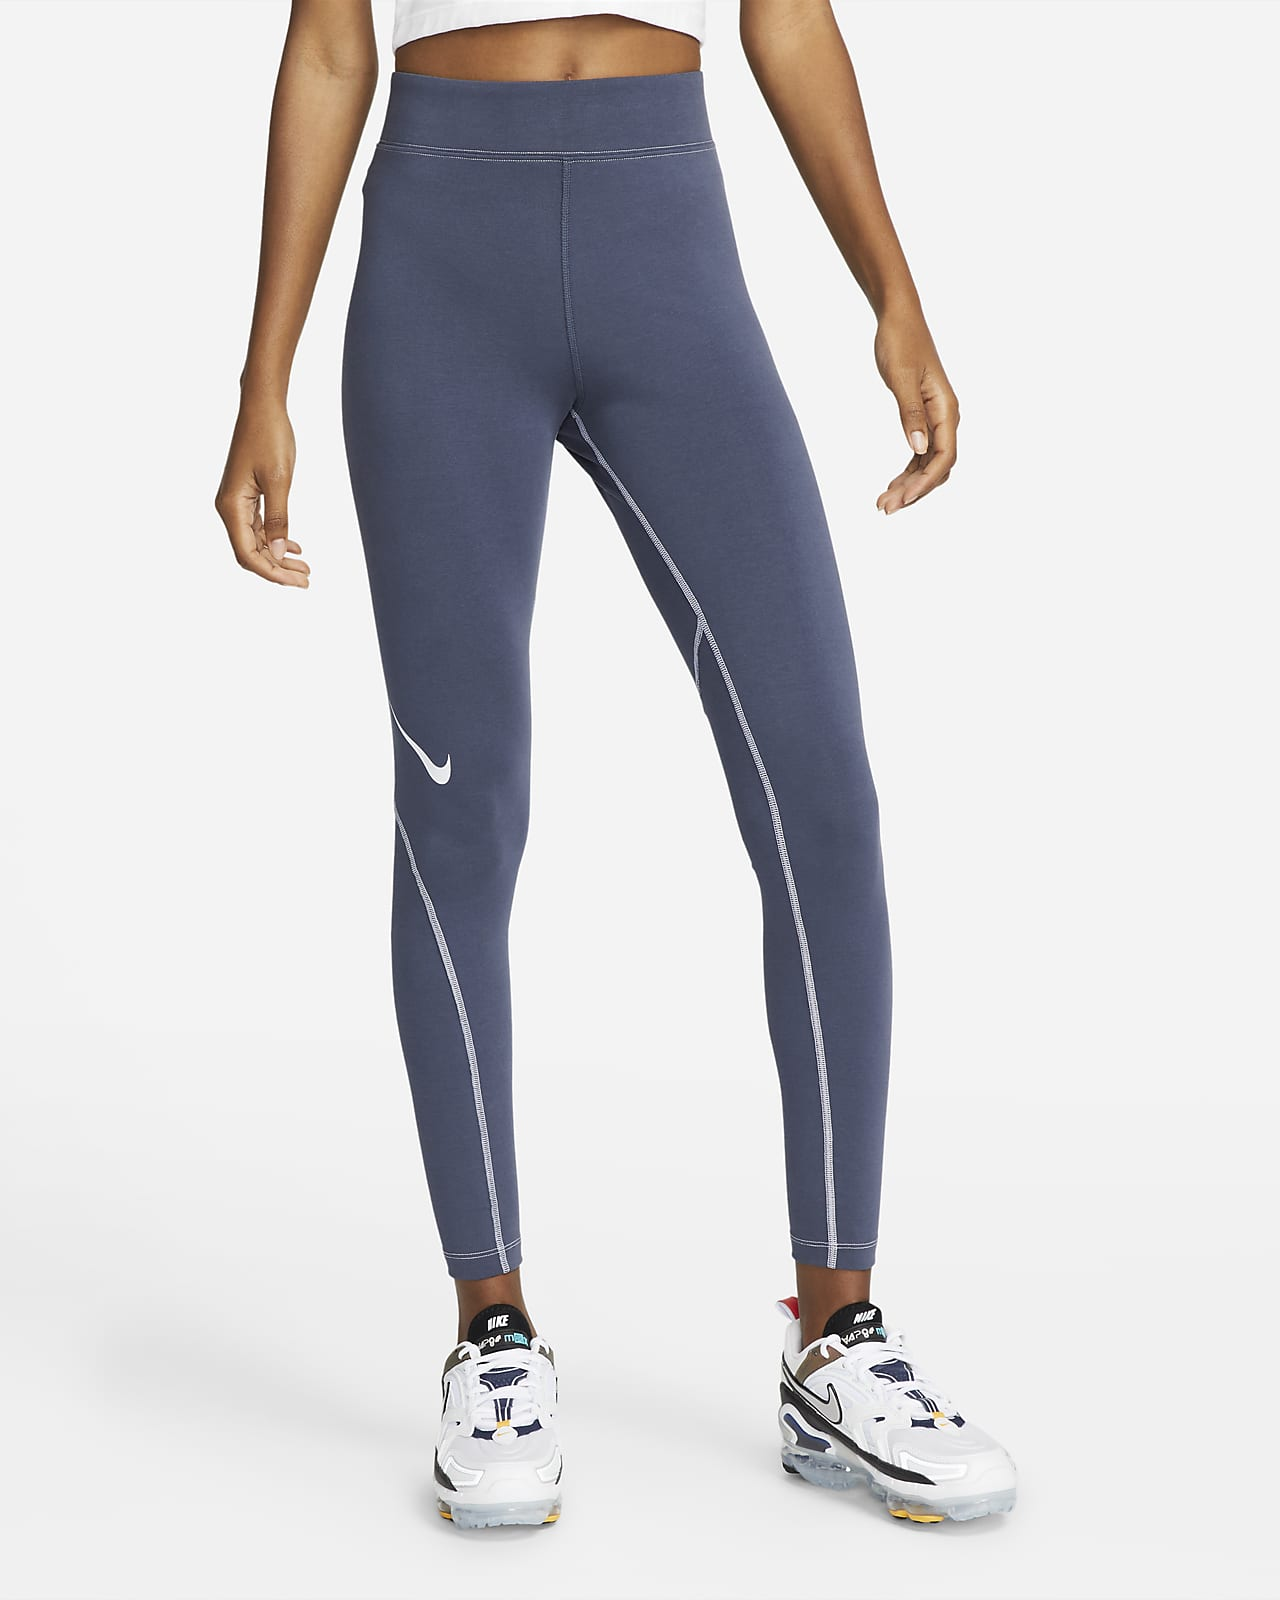 Nike Sportswear Swoosh Women's Graphic High-Rise 7/8 Leggings